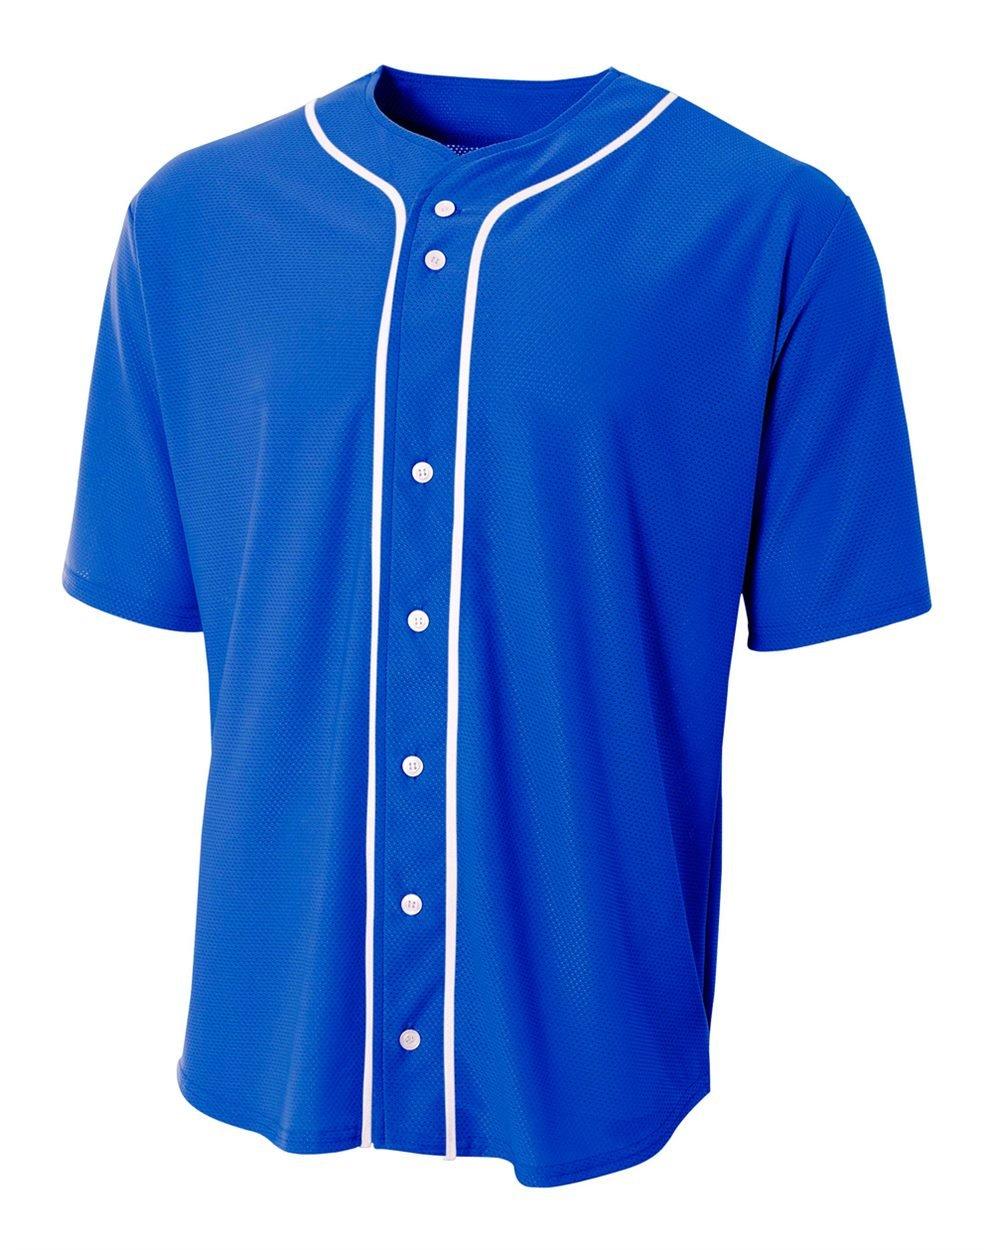 A4 Sportswear Royal Blue Youth Medium (Blank) Full-Button Baseball Wicking Jersey by A4 Sportswear